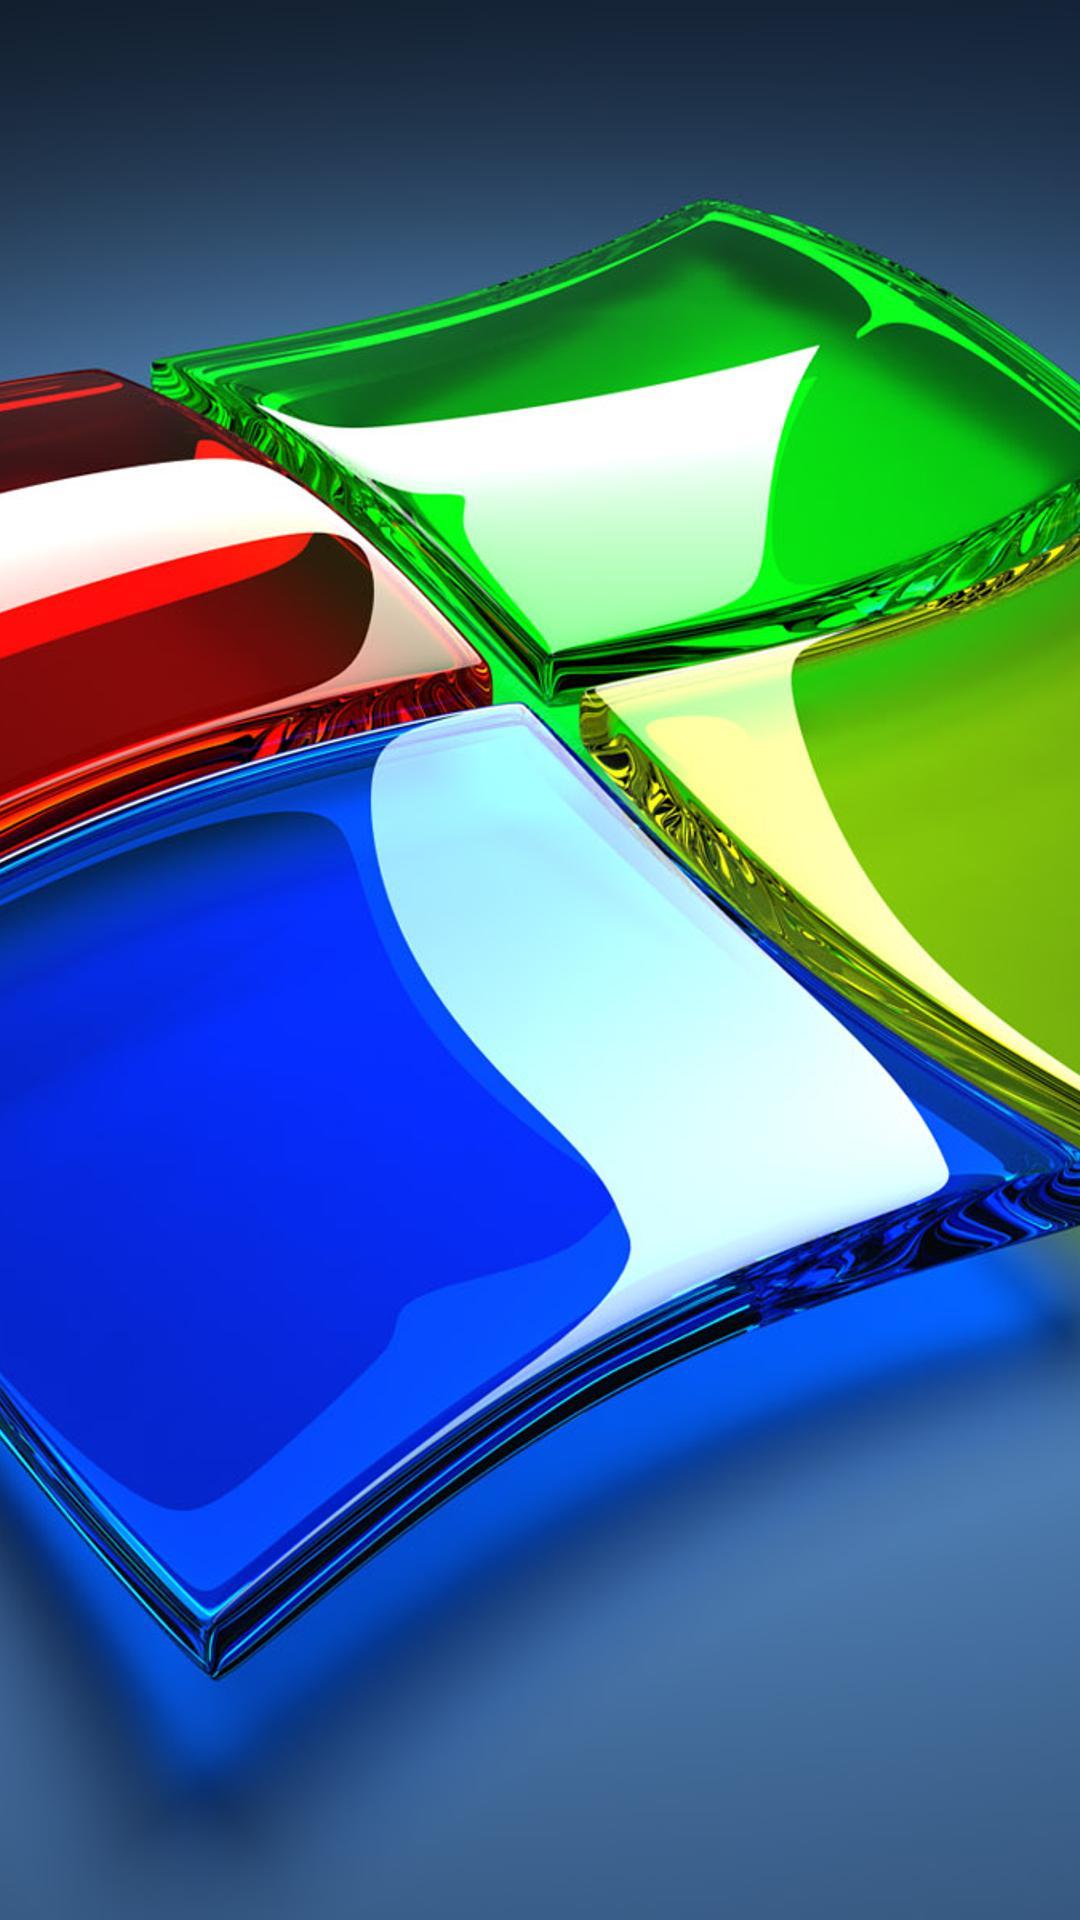 Download Wallpaper 1080x1920 Windows 7 Logo